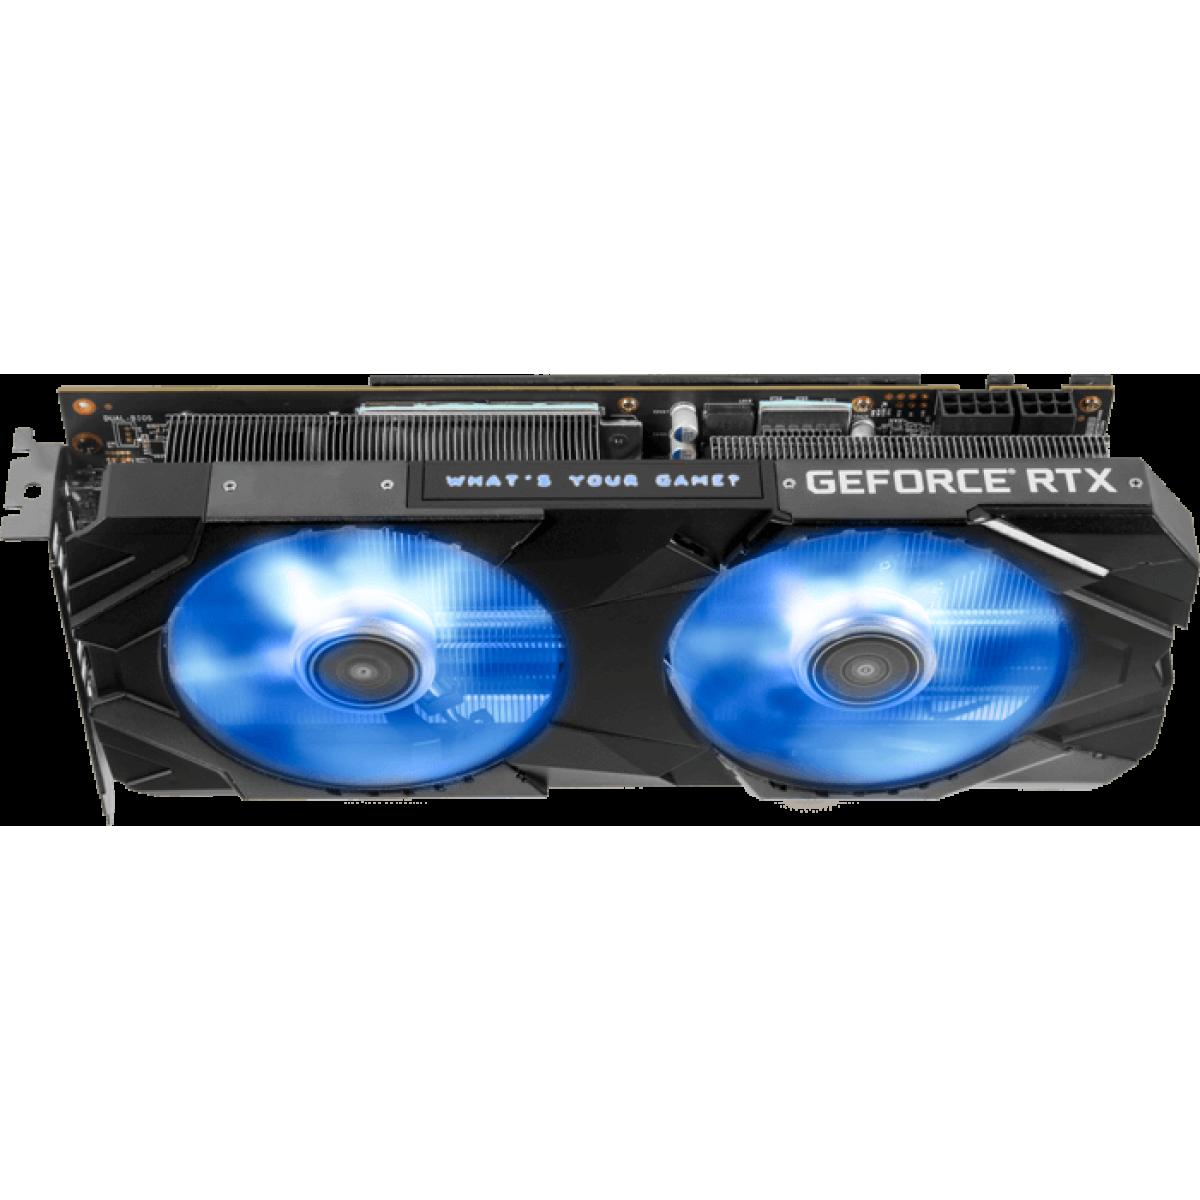 Placa de Vídeo Galax Geforce RTX 2070 EX OC Dual, 8GB GDDR6, 256Bit